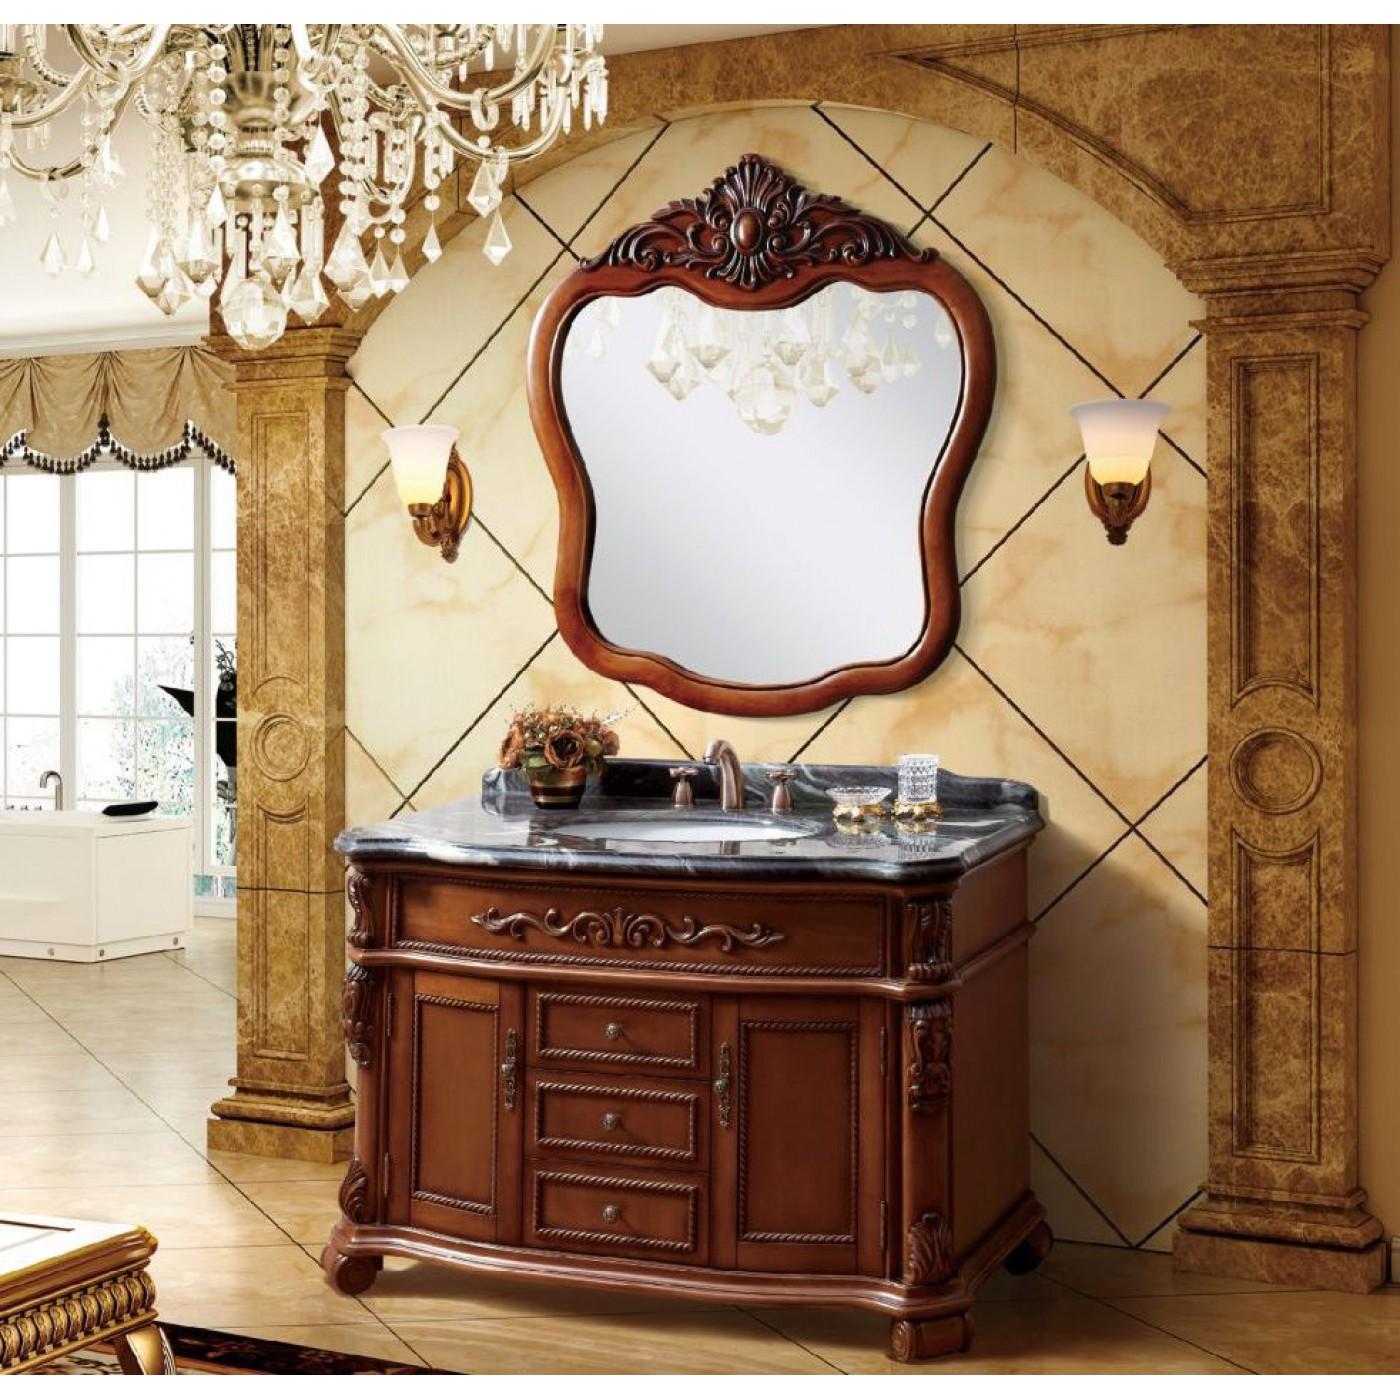 ADAGIO, мебель для ванных комнат, TESSORO